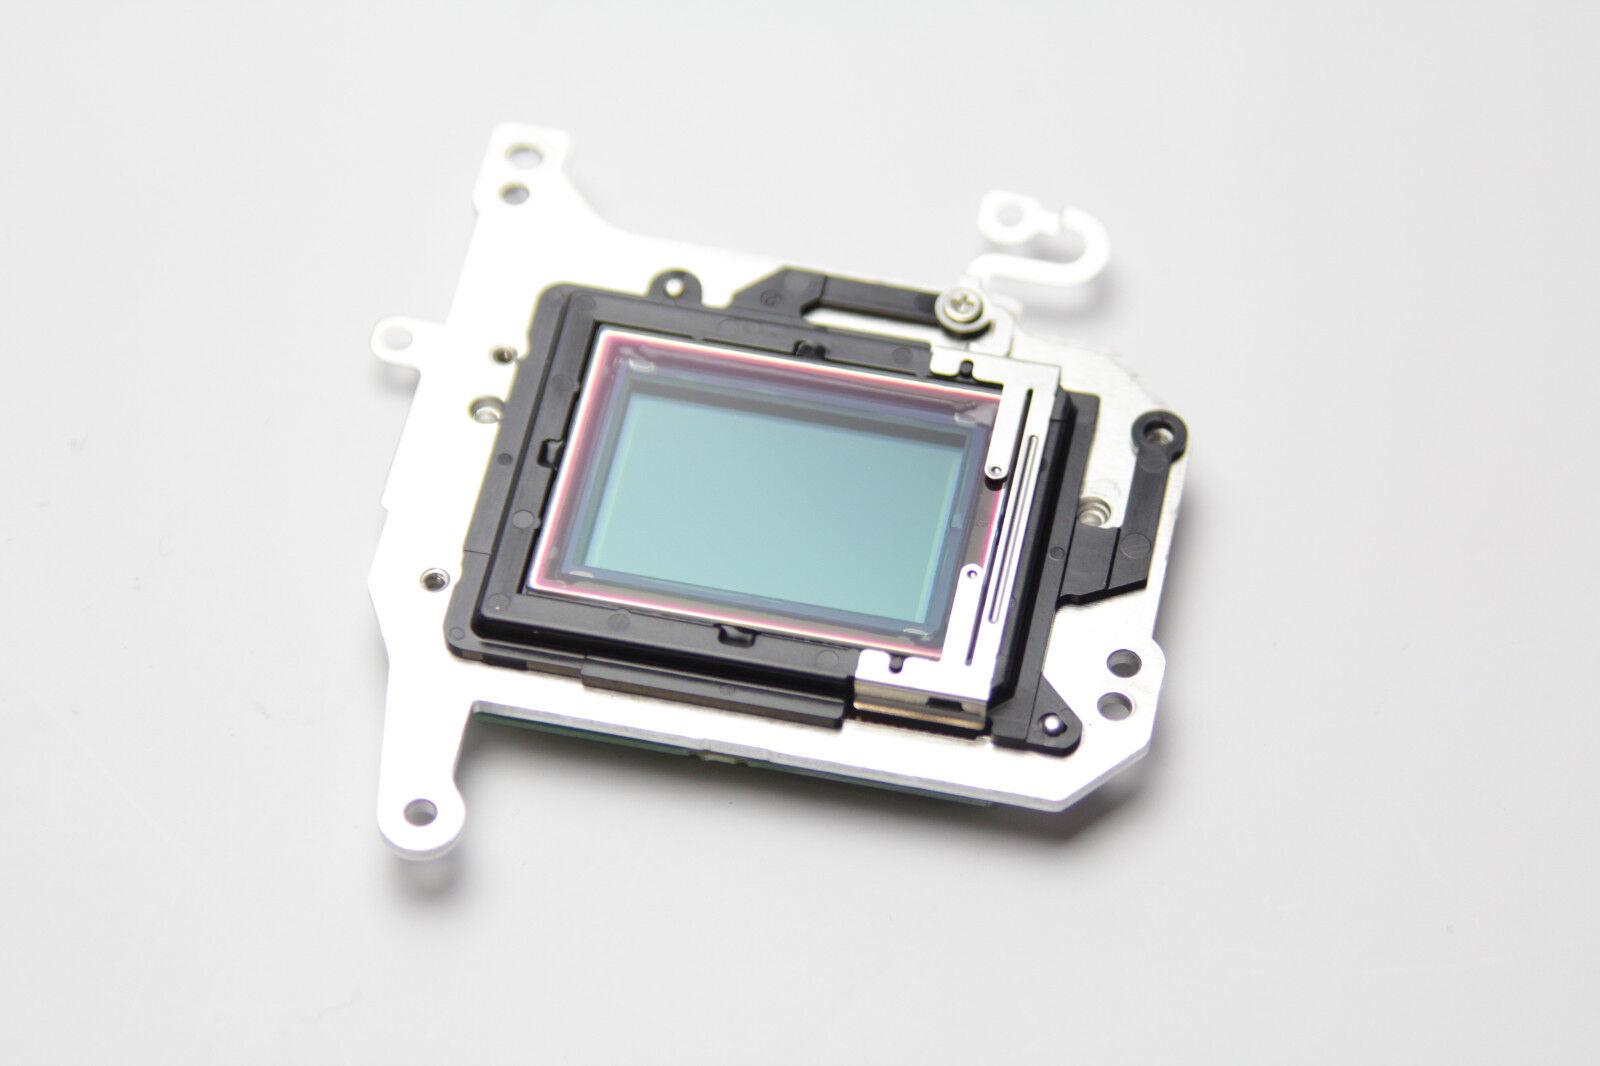 Details About Canon Eos 1200d Rebel T5 X70 Ccd Sensor Replacement Repair Part Dh4991